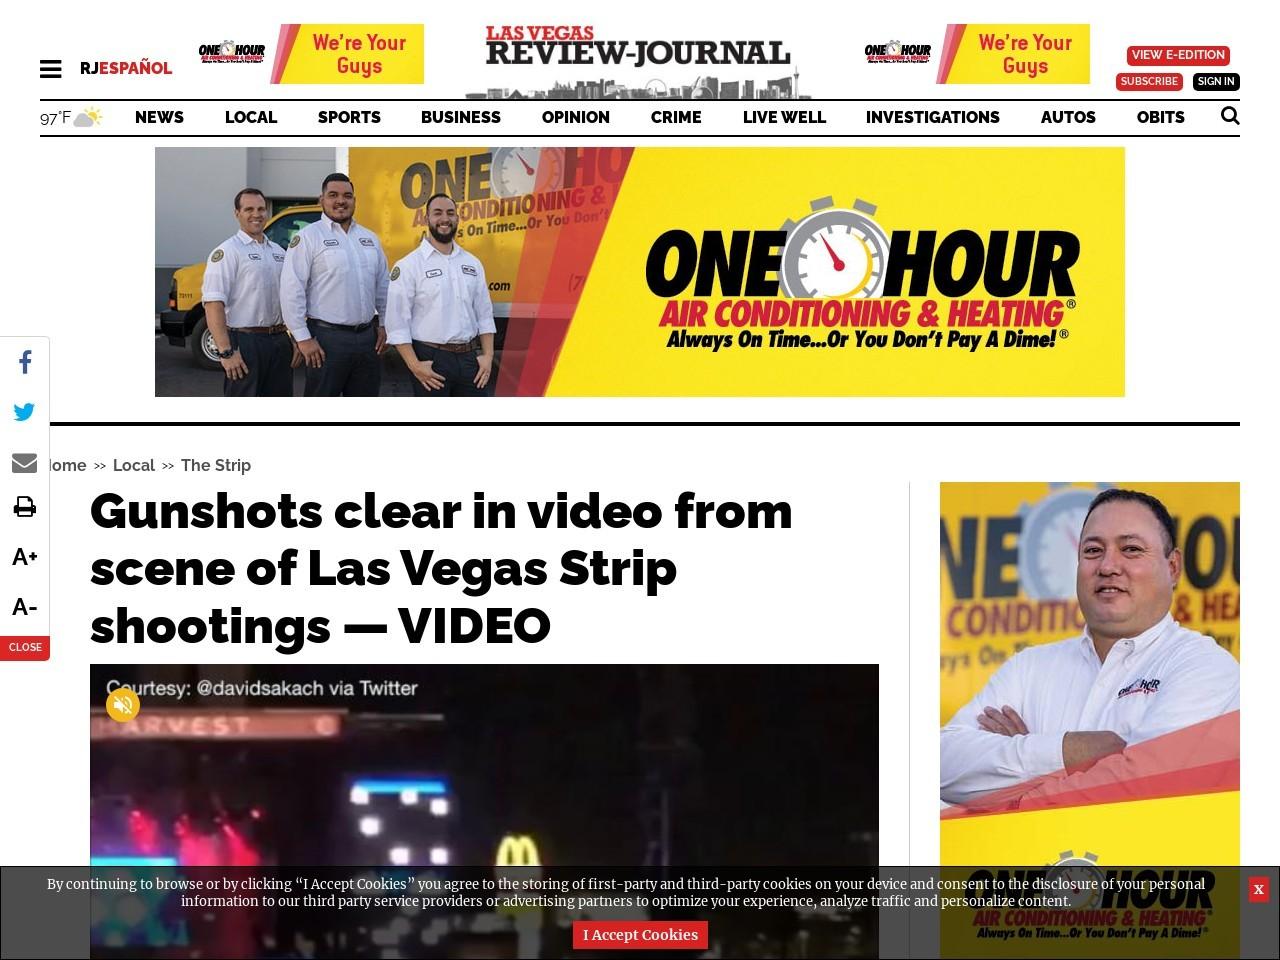 Gunshots clear in video from scene of Las Vegas Strip shootings — VIDEO